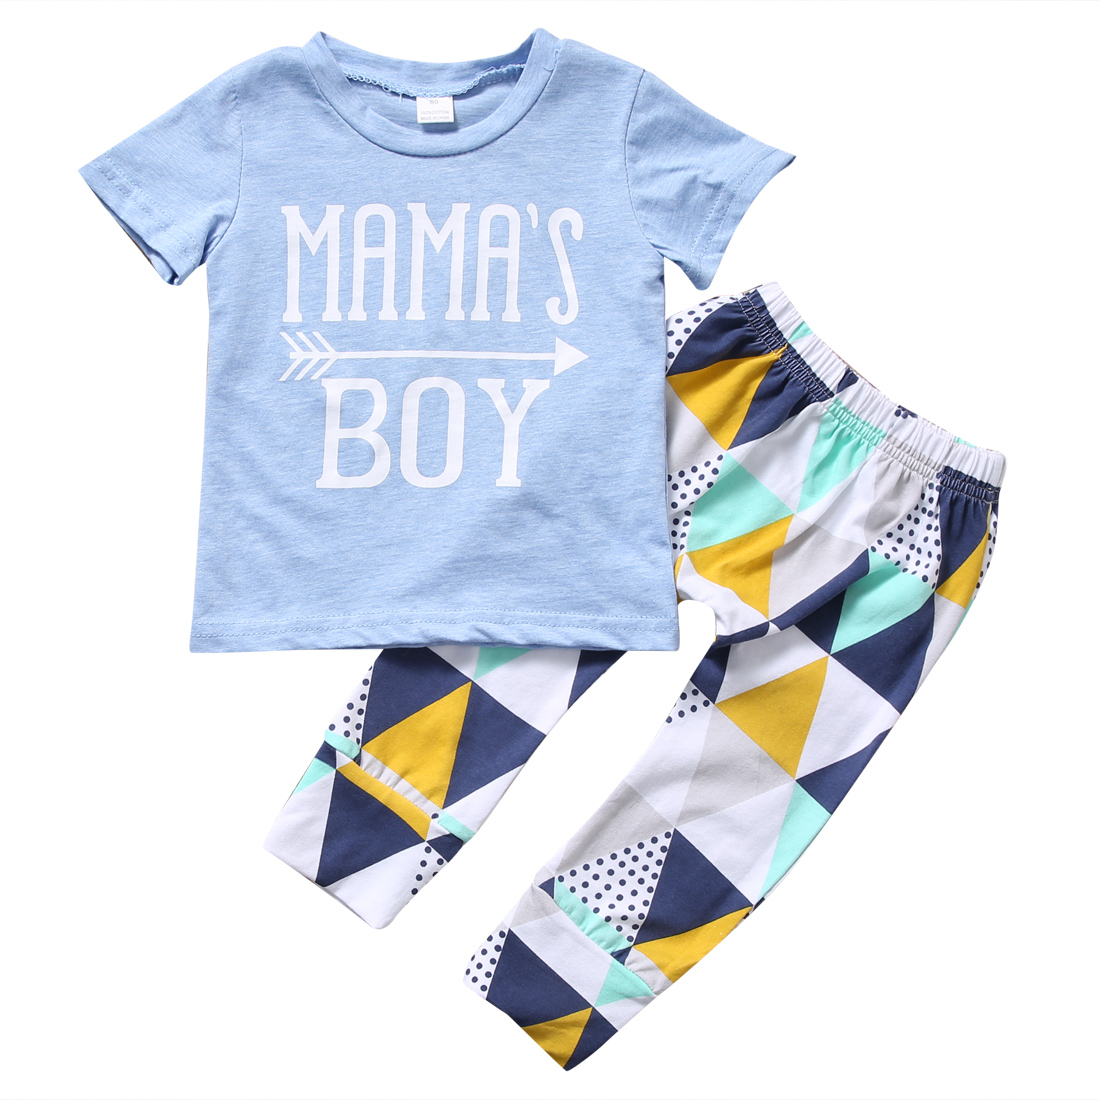 Fishing Buddy Mine Calls Me Dad Toddler Boys Girls Short Sleeve T Shirt Kids Summer Top Tee 100/% Cotton Clothes 2-6 T